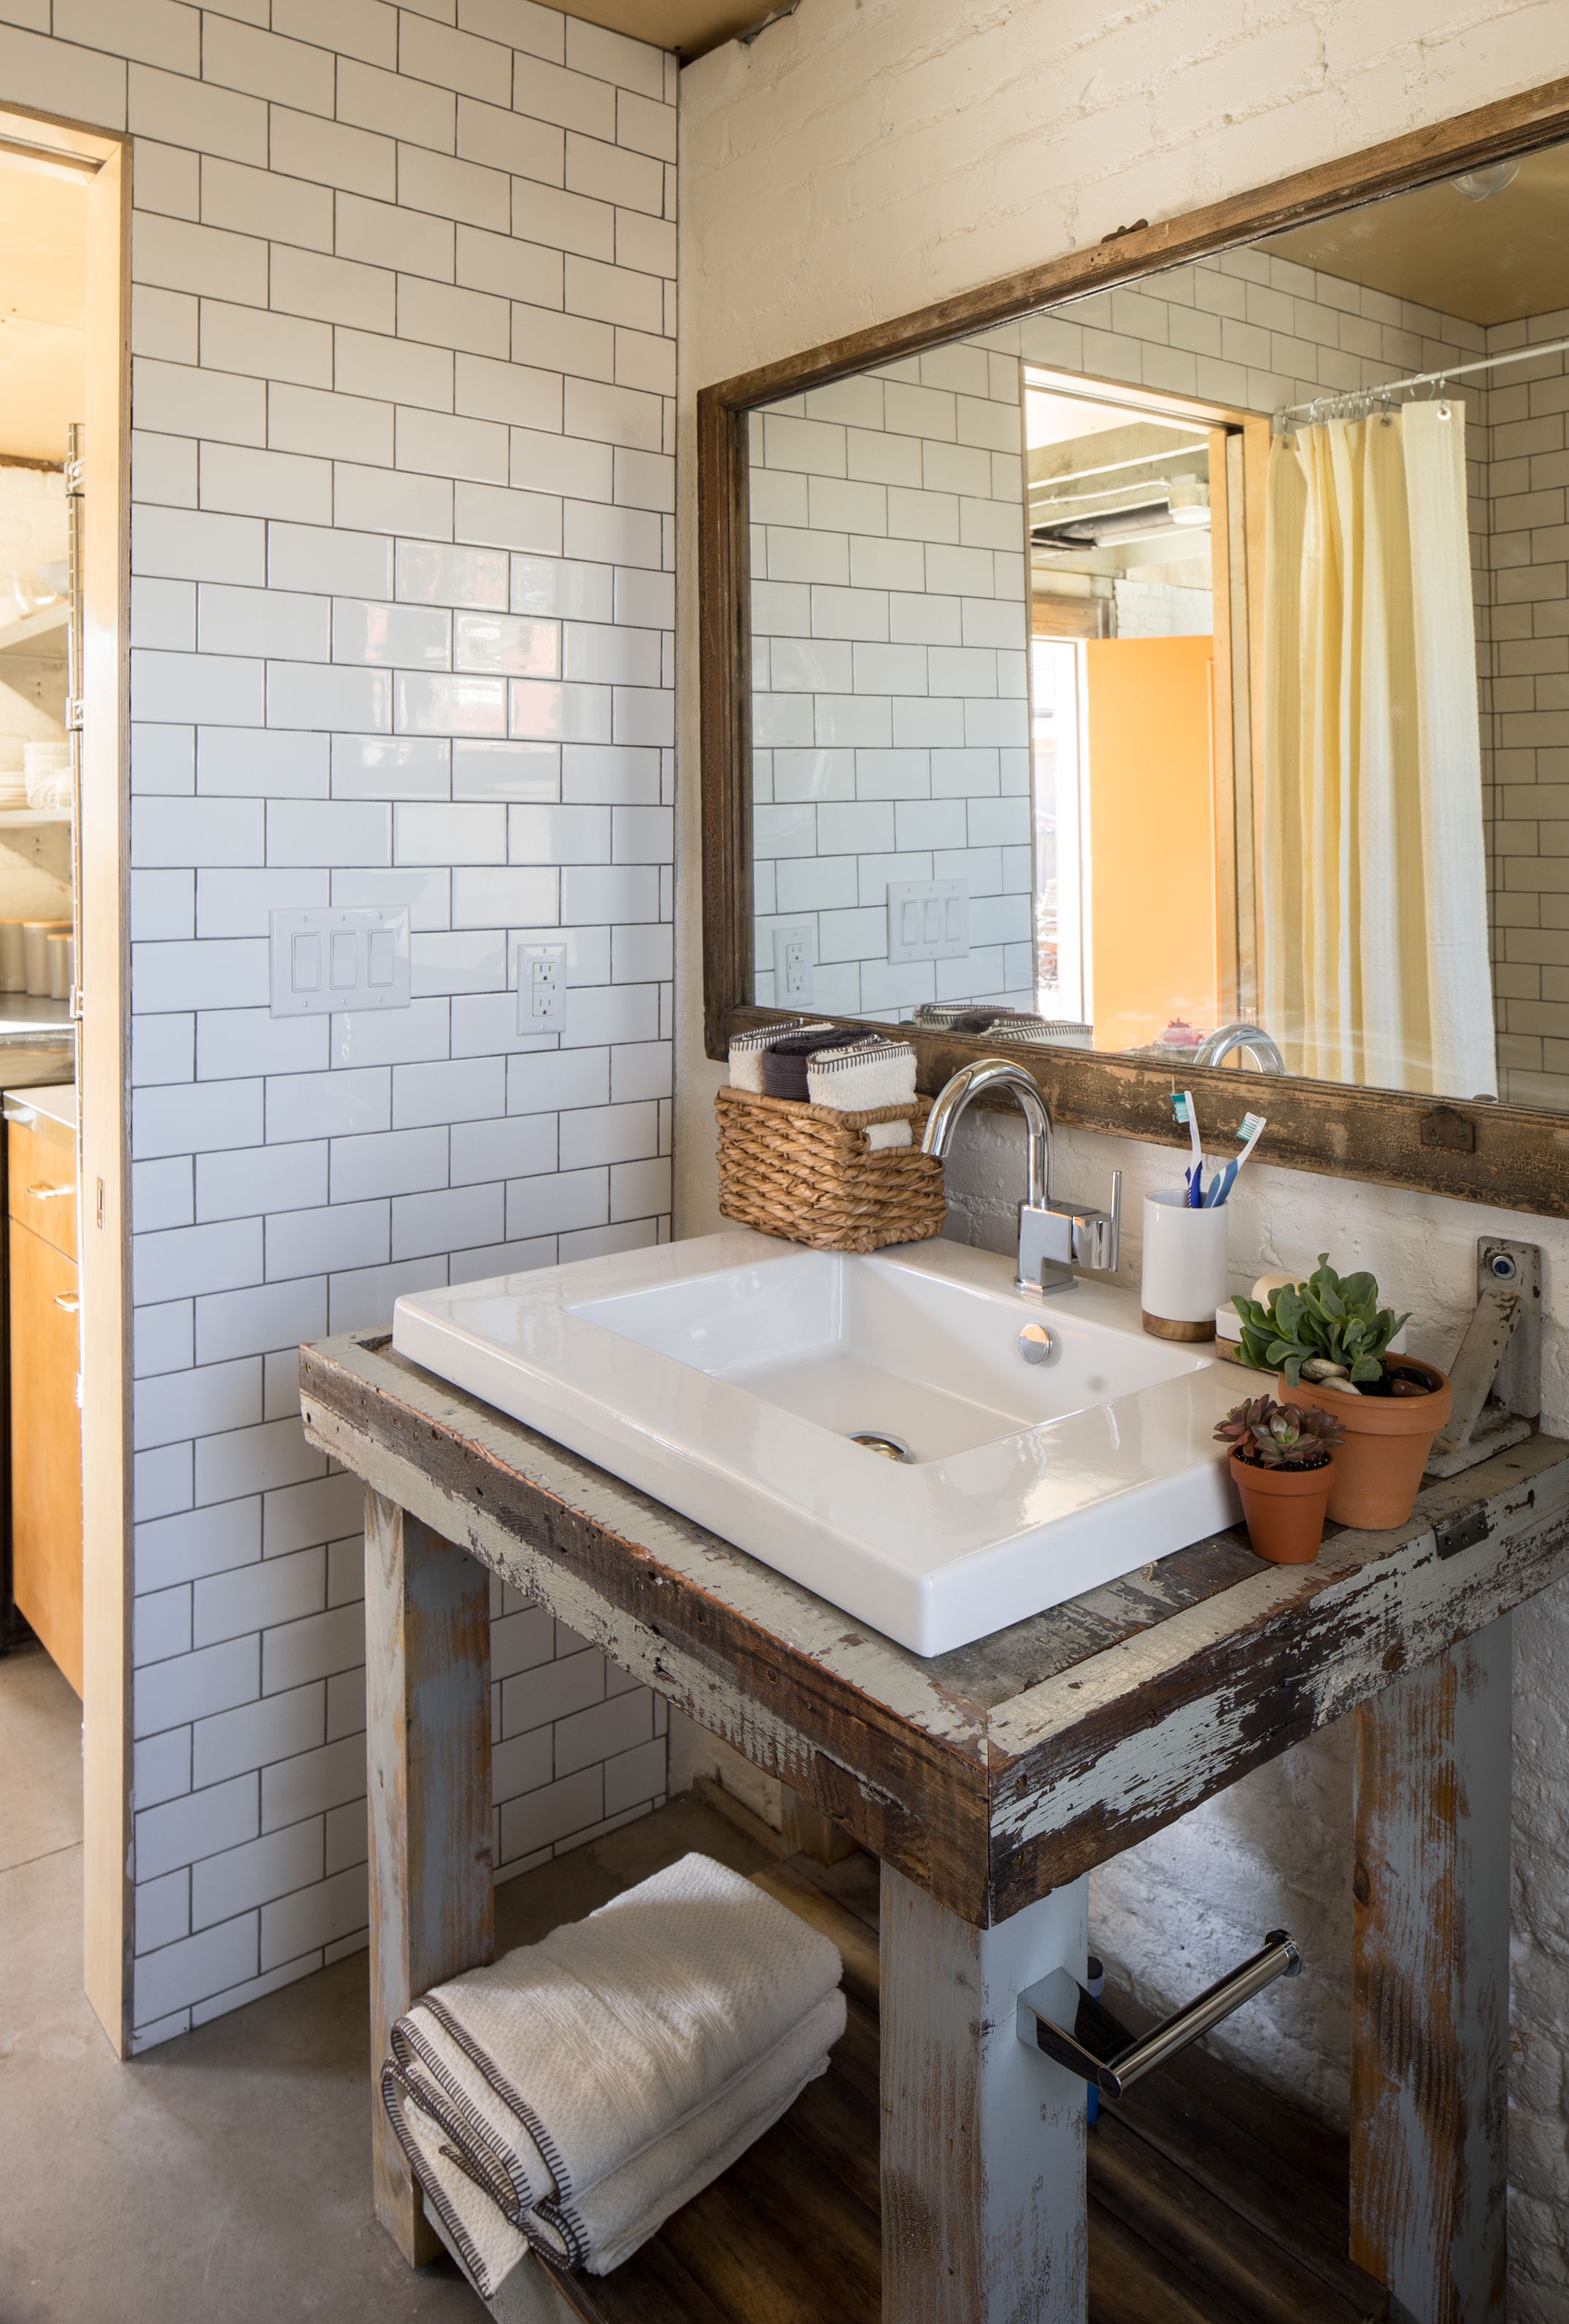 DIY Rustic Bathroom Vanity Ideas